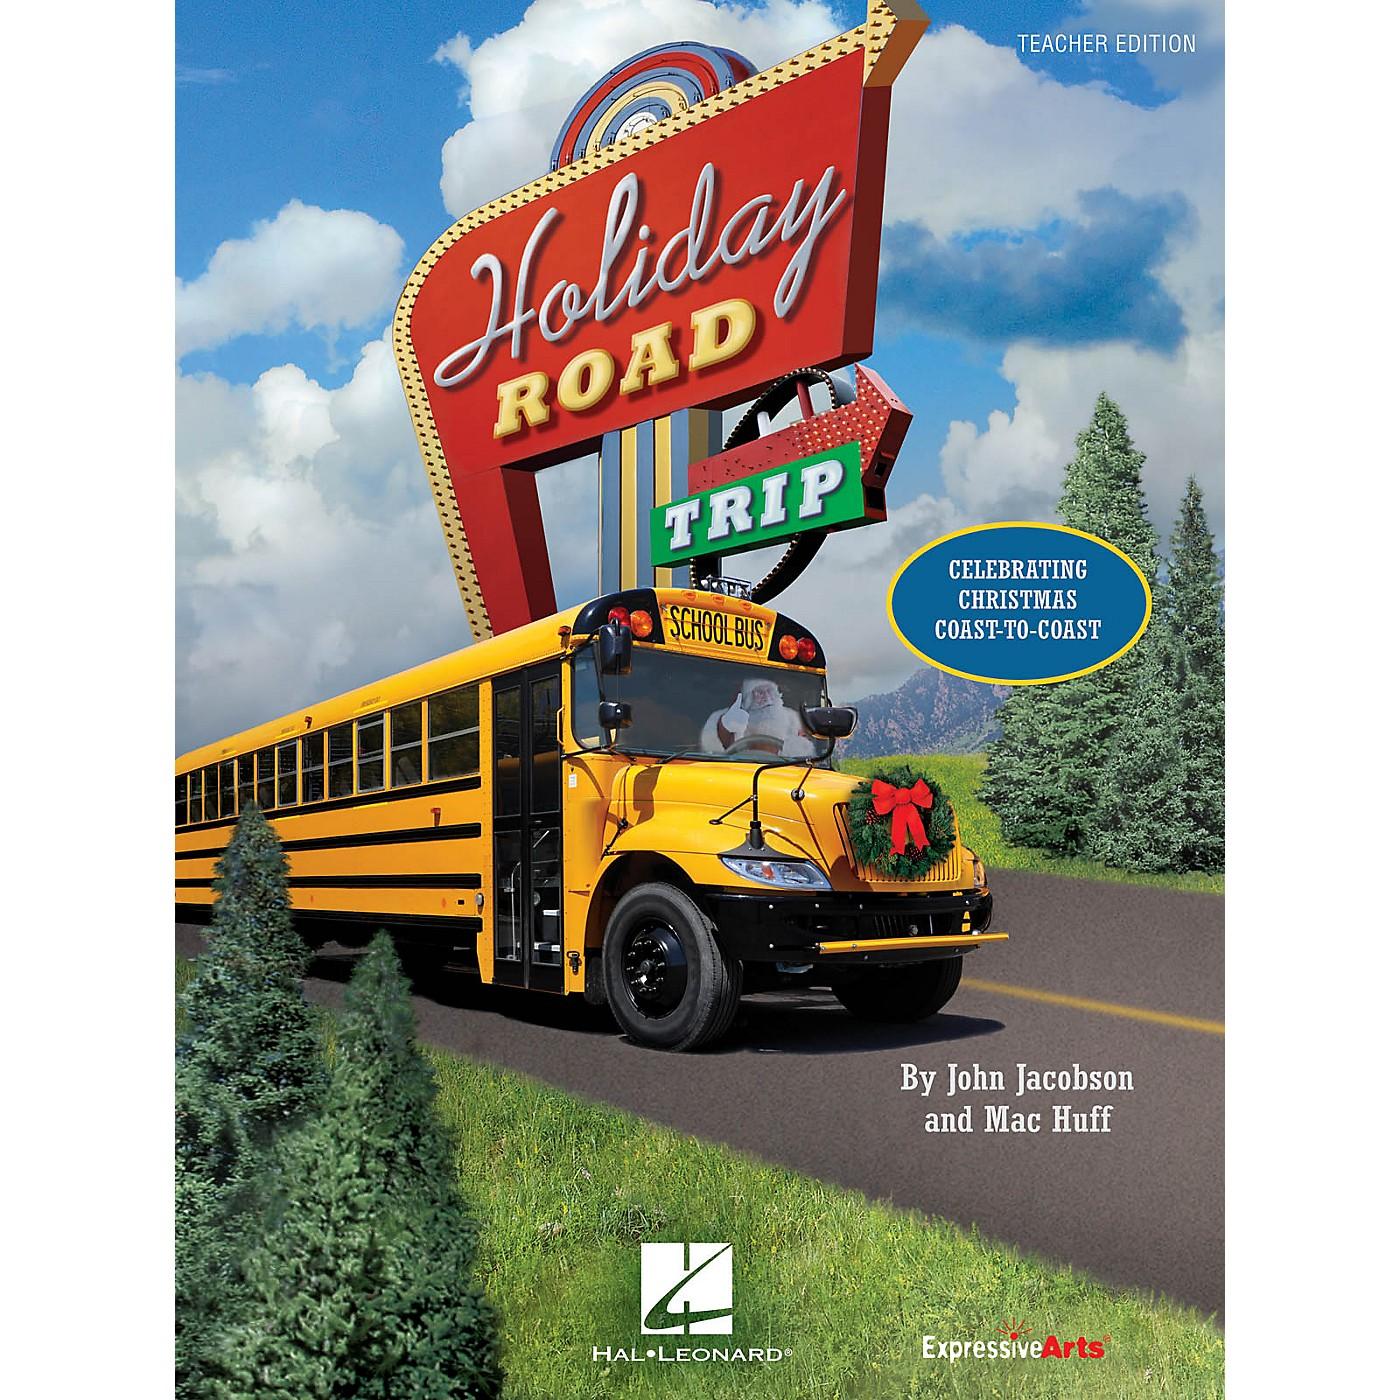 Hal Leonard Holiday Road Trip (Celebrating Christmas Coast-to-Coast) Performance Kit with CD by John Jacobson thumbnail